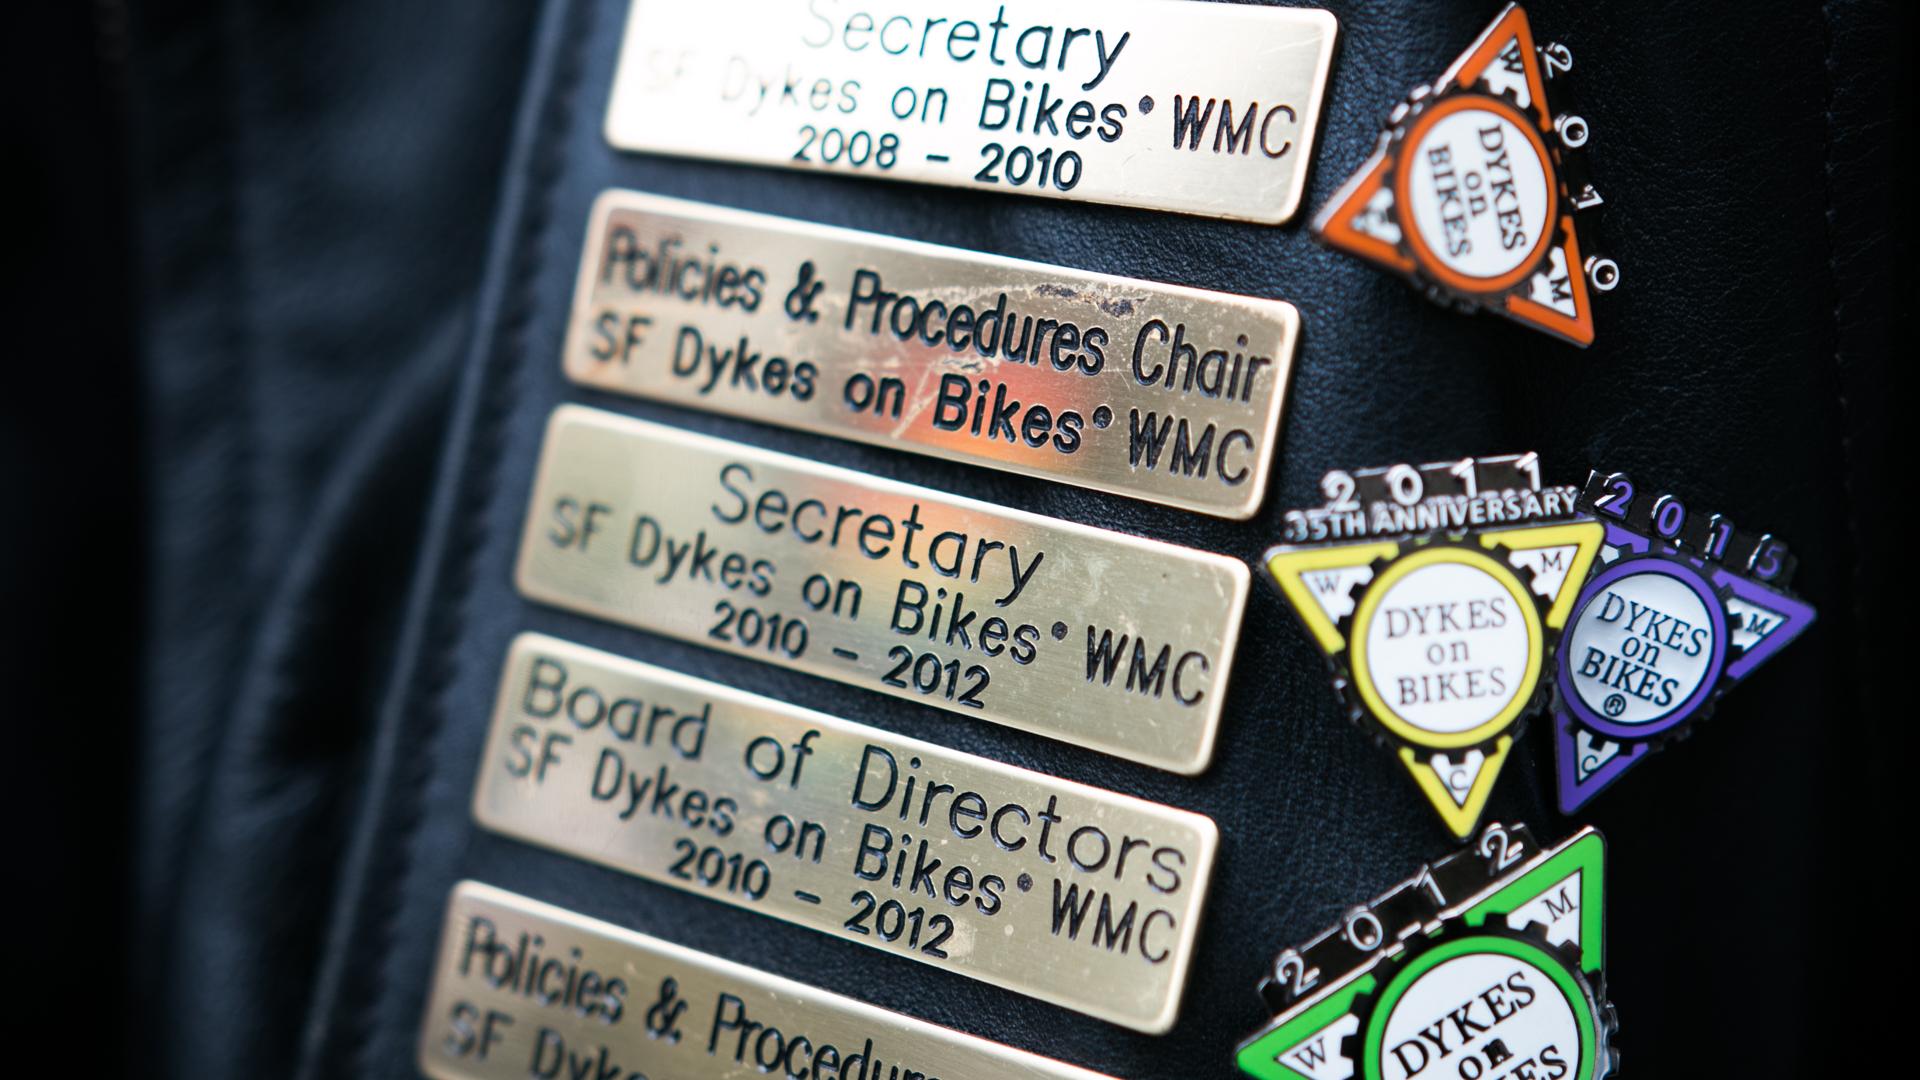 Soni Wolf, secretary of San Francisco Dykes on Bikes (Jeremy Raff/KQED).